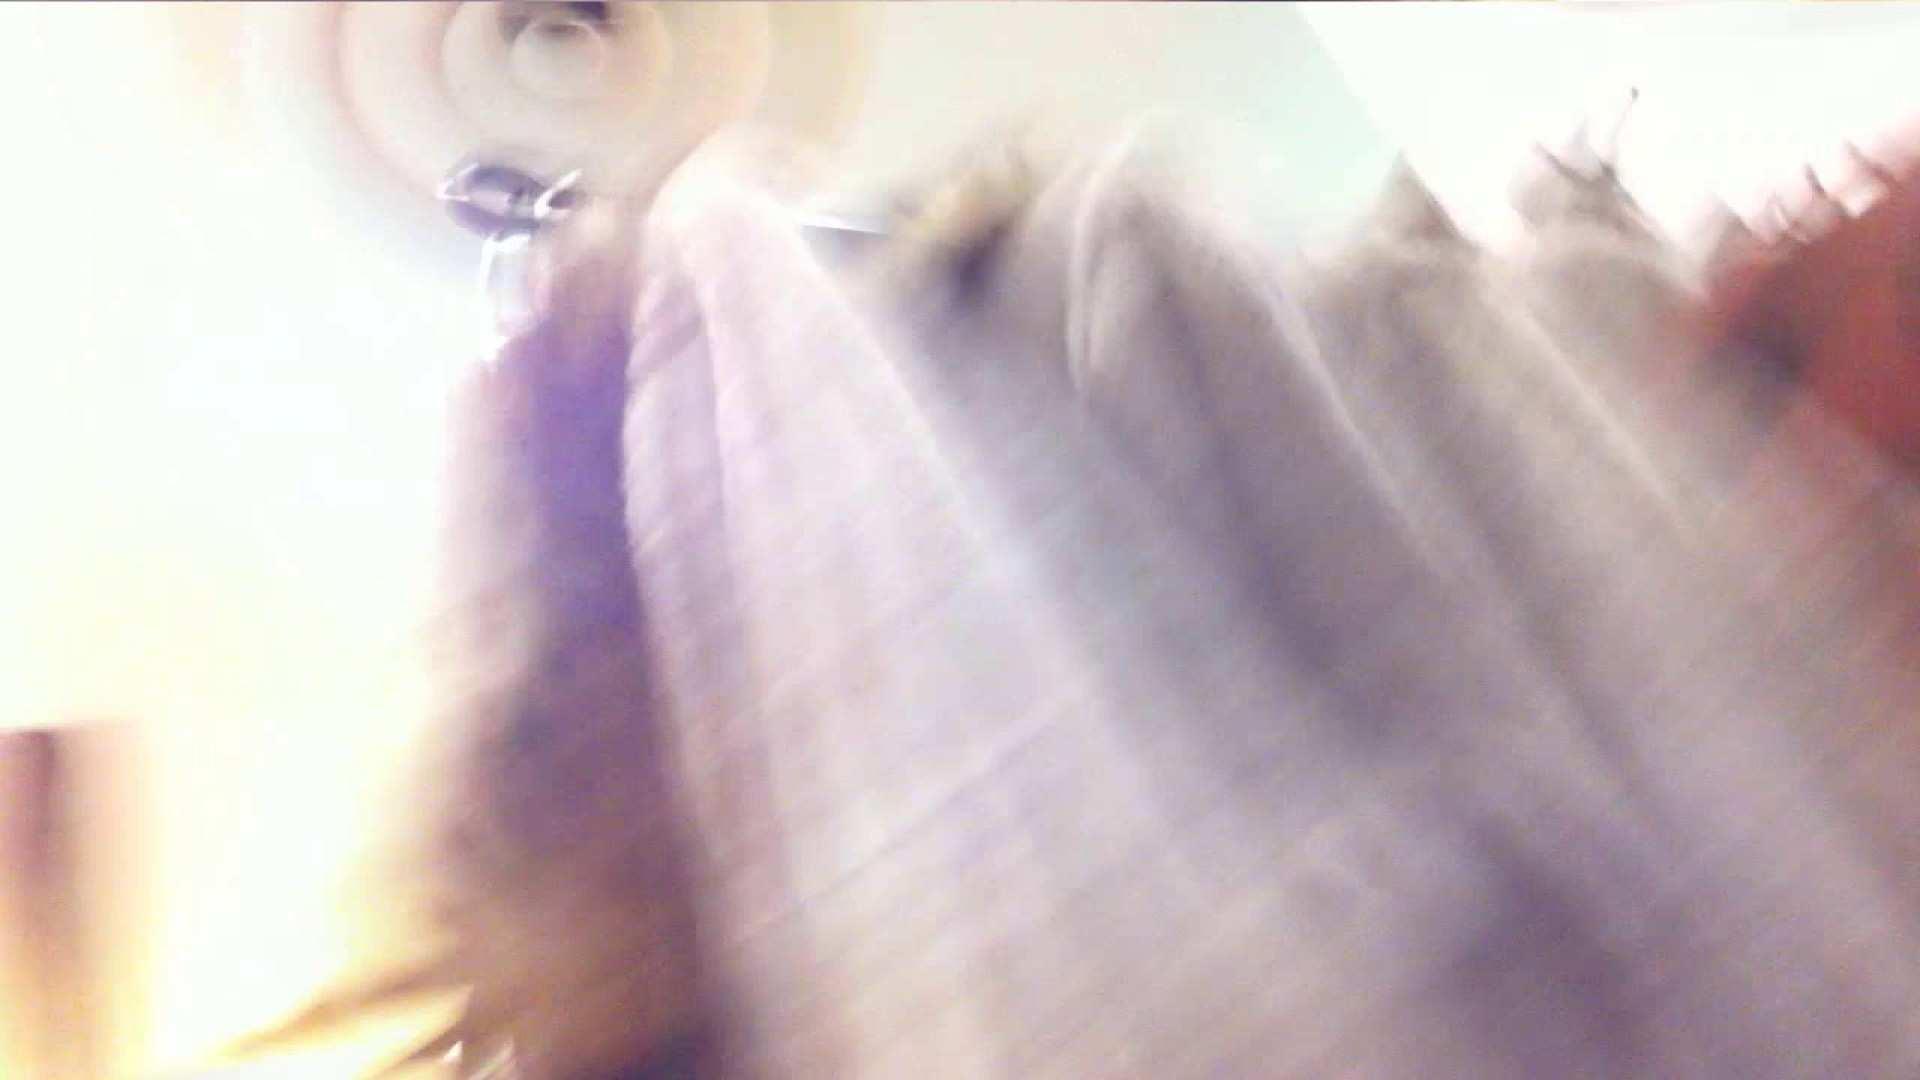 vol.33 美人アパレル胸チラ&パンチラ ギャル系ネーチャンの下着 下着姿 盗み撮り動画 94pic 67